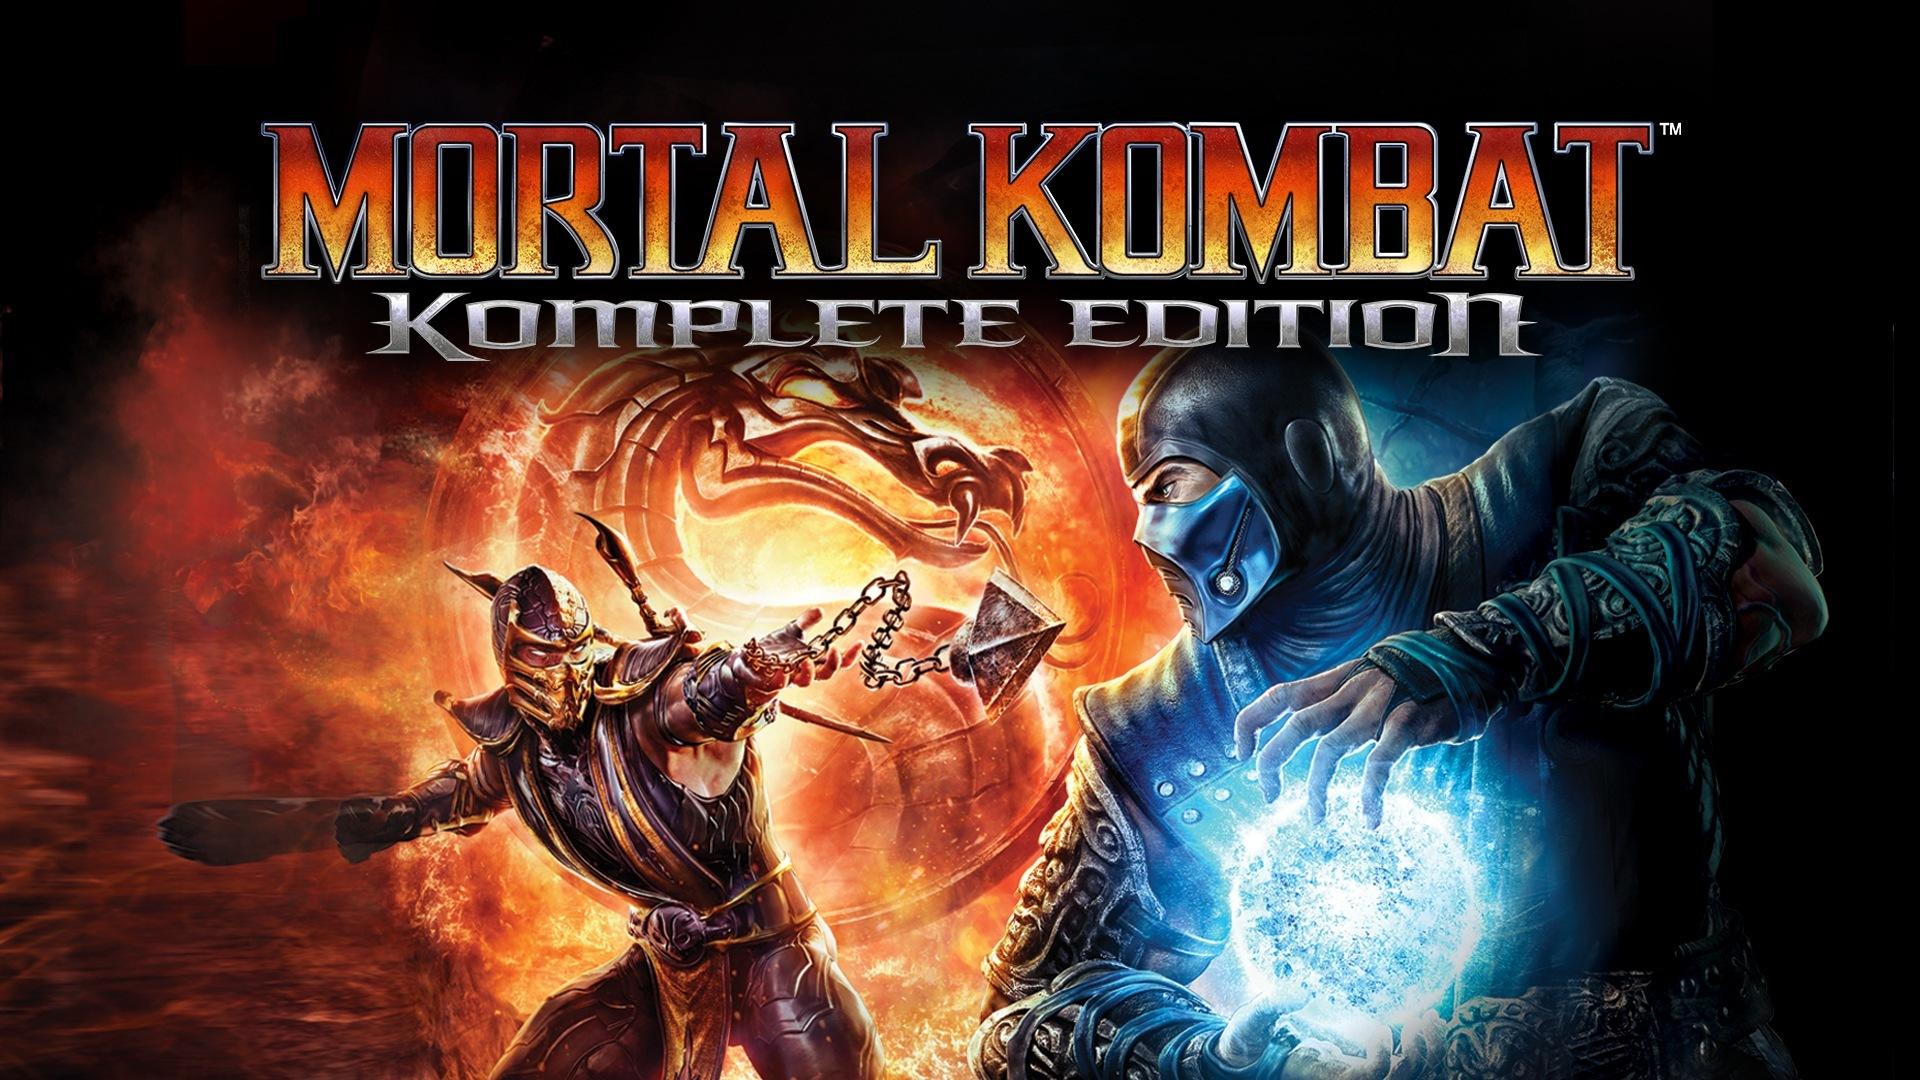 Mortal Kombat Komplete Edition | PC Steam Game | Fanatical